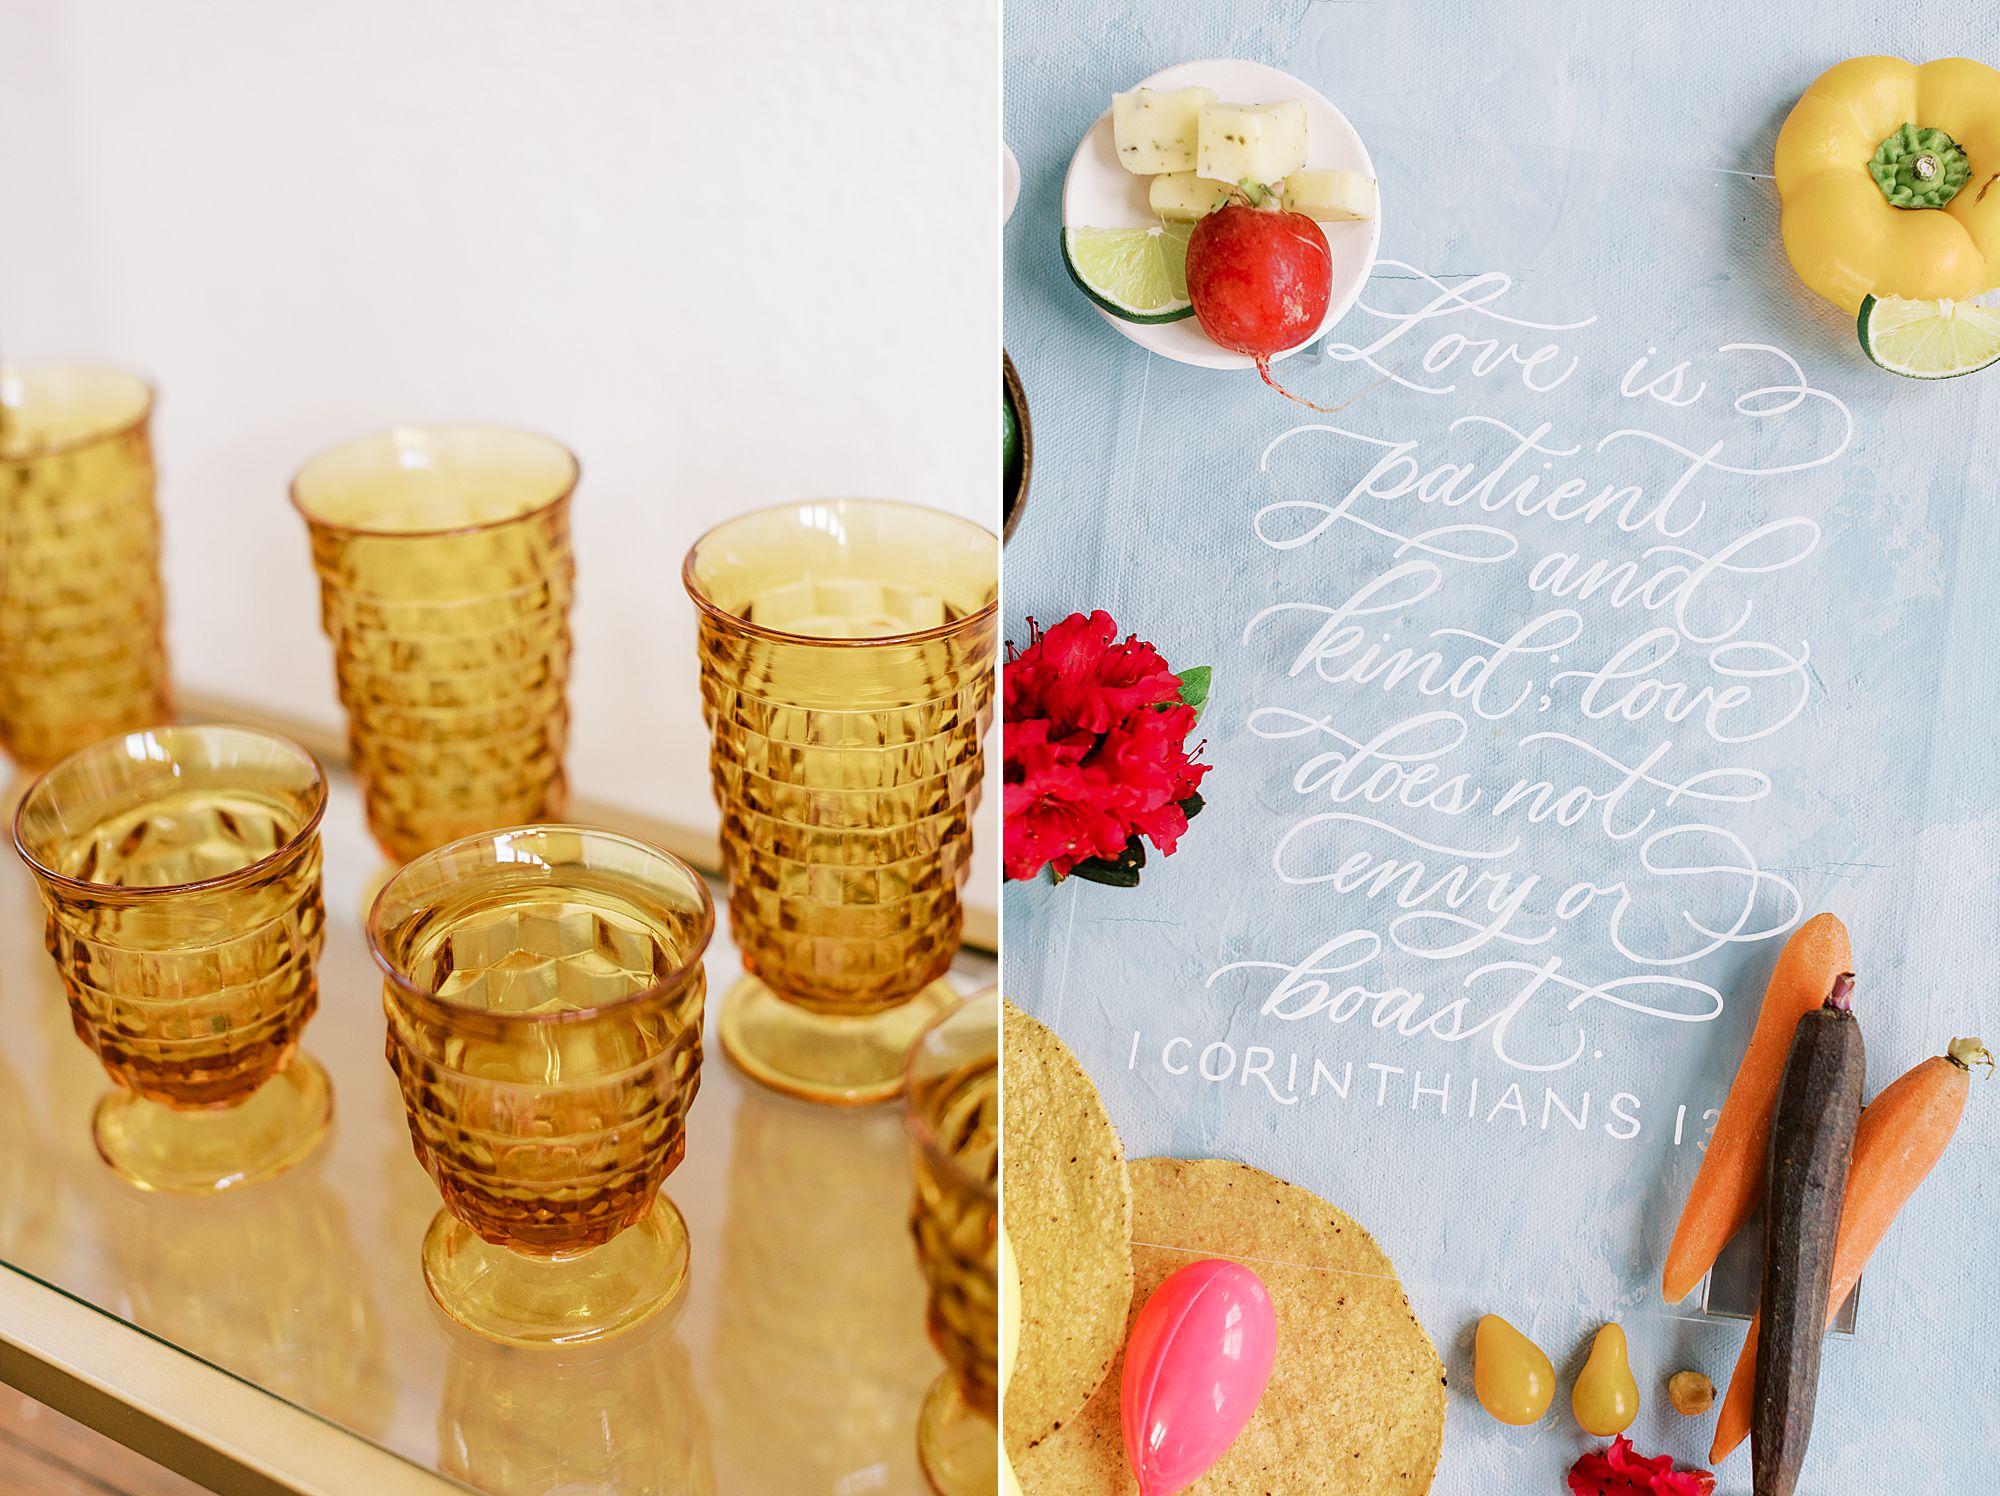 Cinco De Mayo Inspiration for Your FIesta - Party Crush Studio and Ashley Baumgartner_0014.jpg